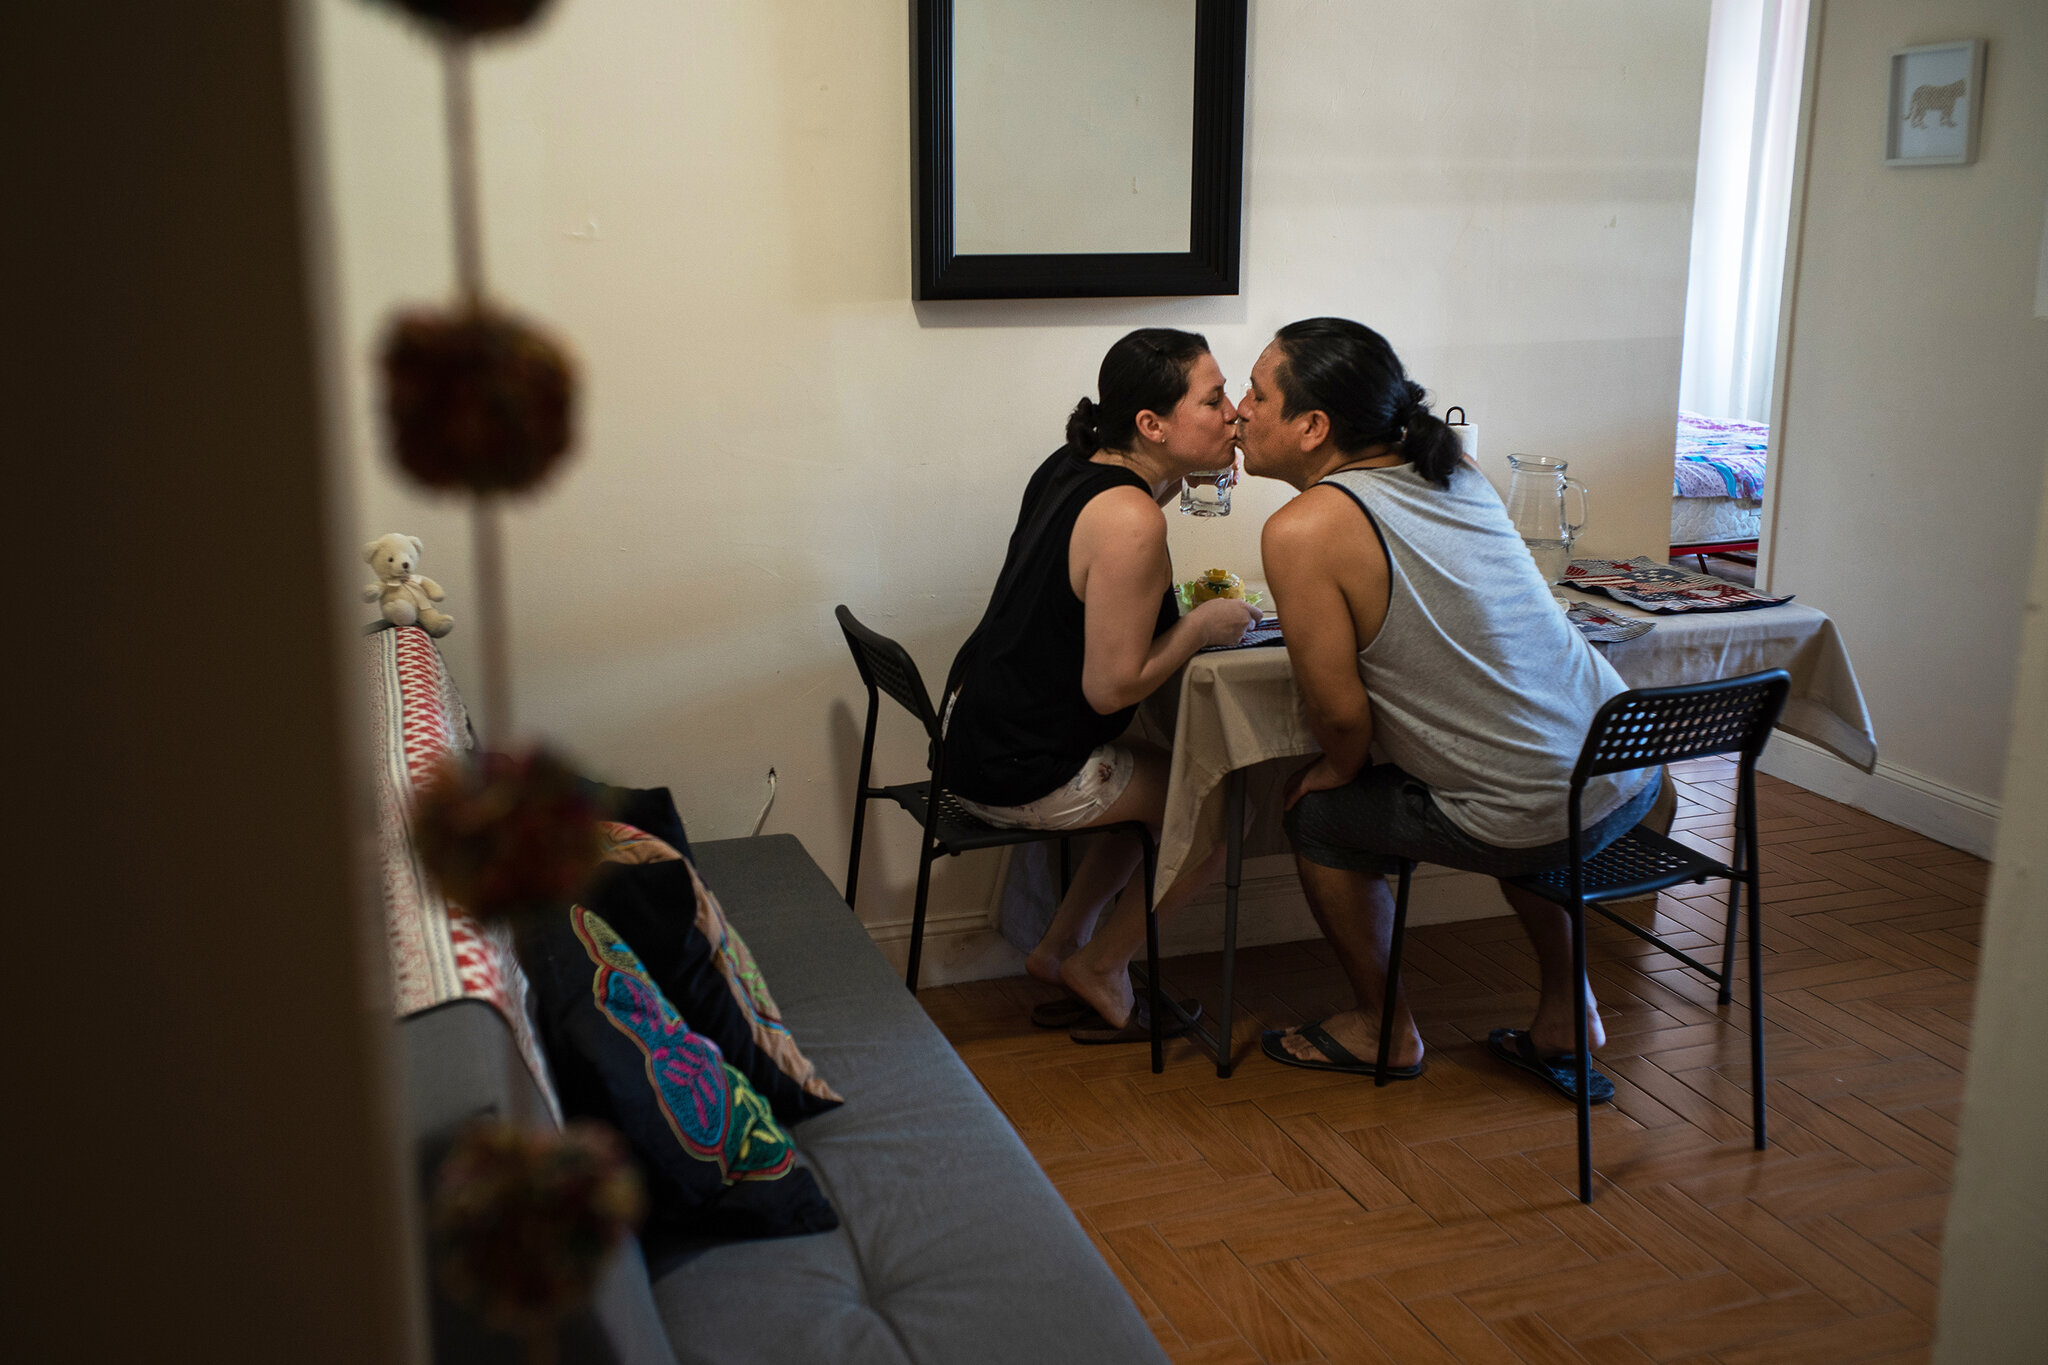 jose y leyla enjoying their meal made with food from Masbia of Flatbush in Brooklyn